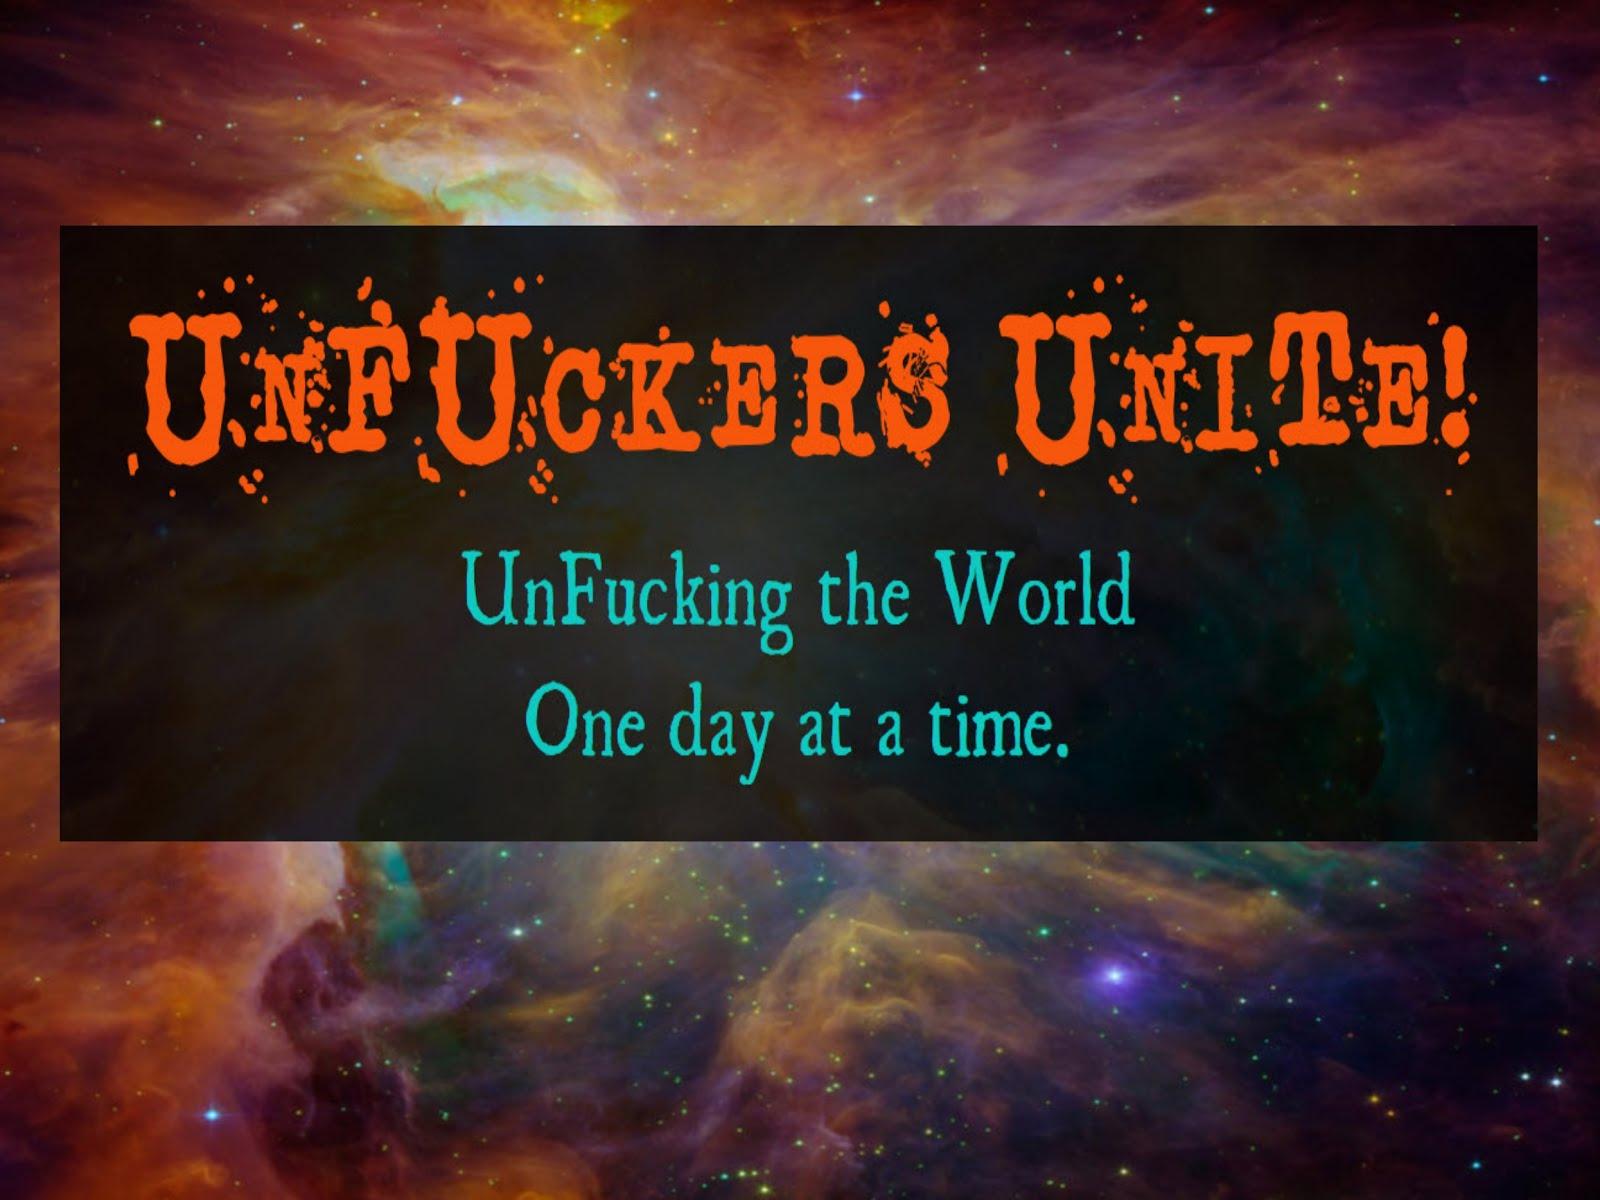 unfuckers unite